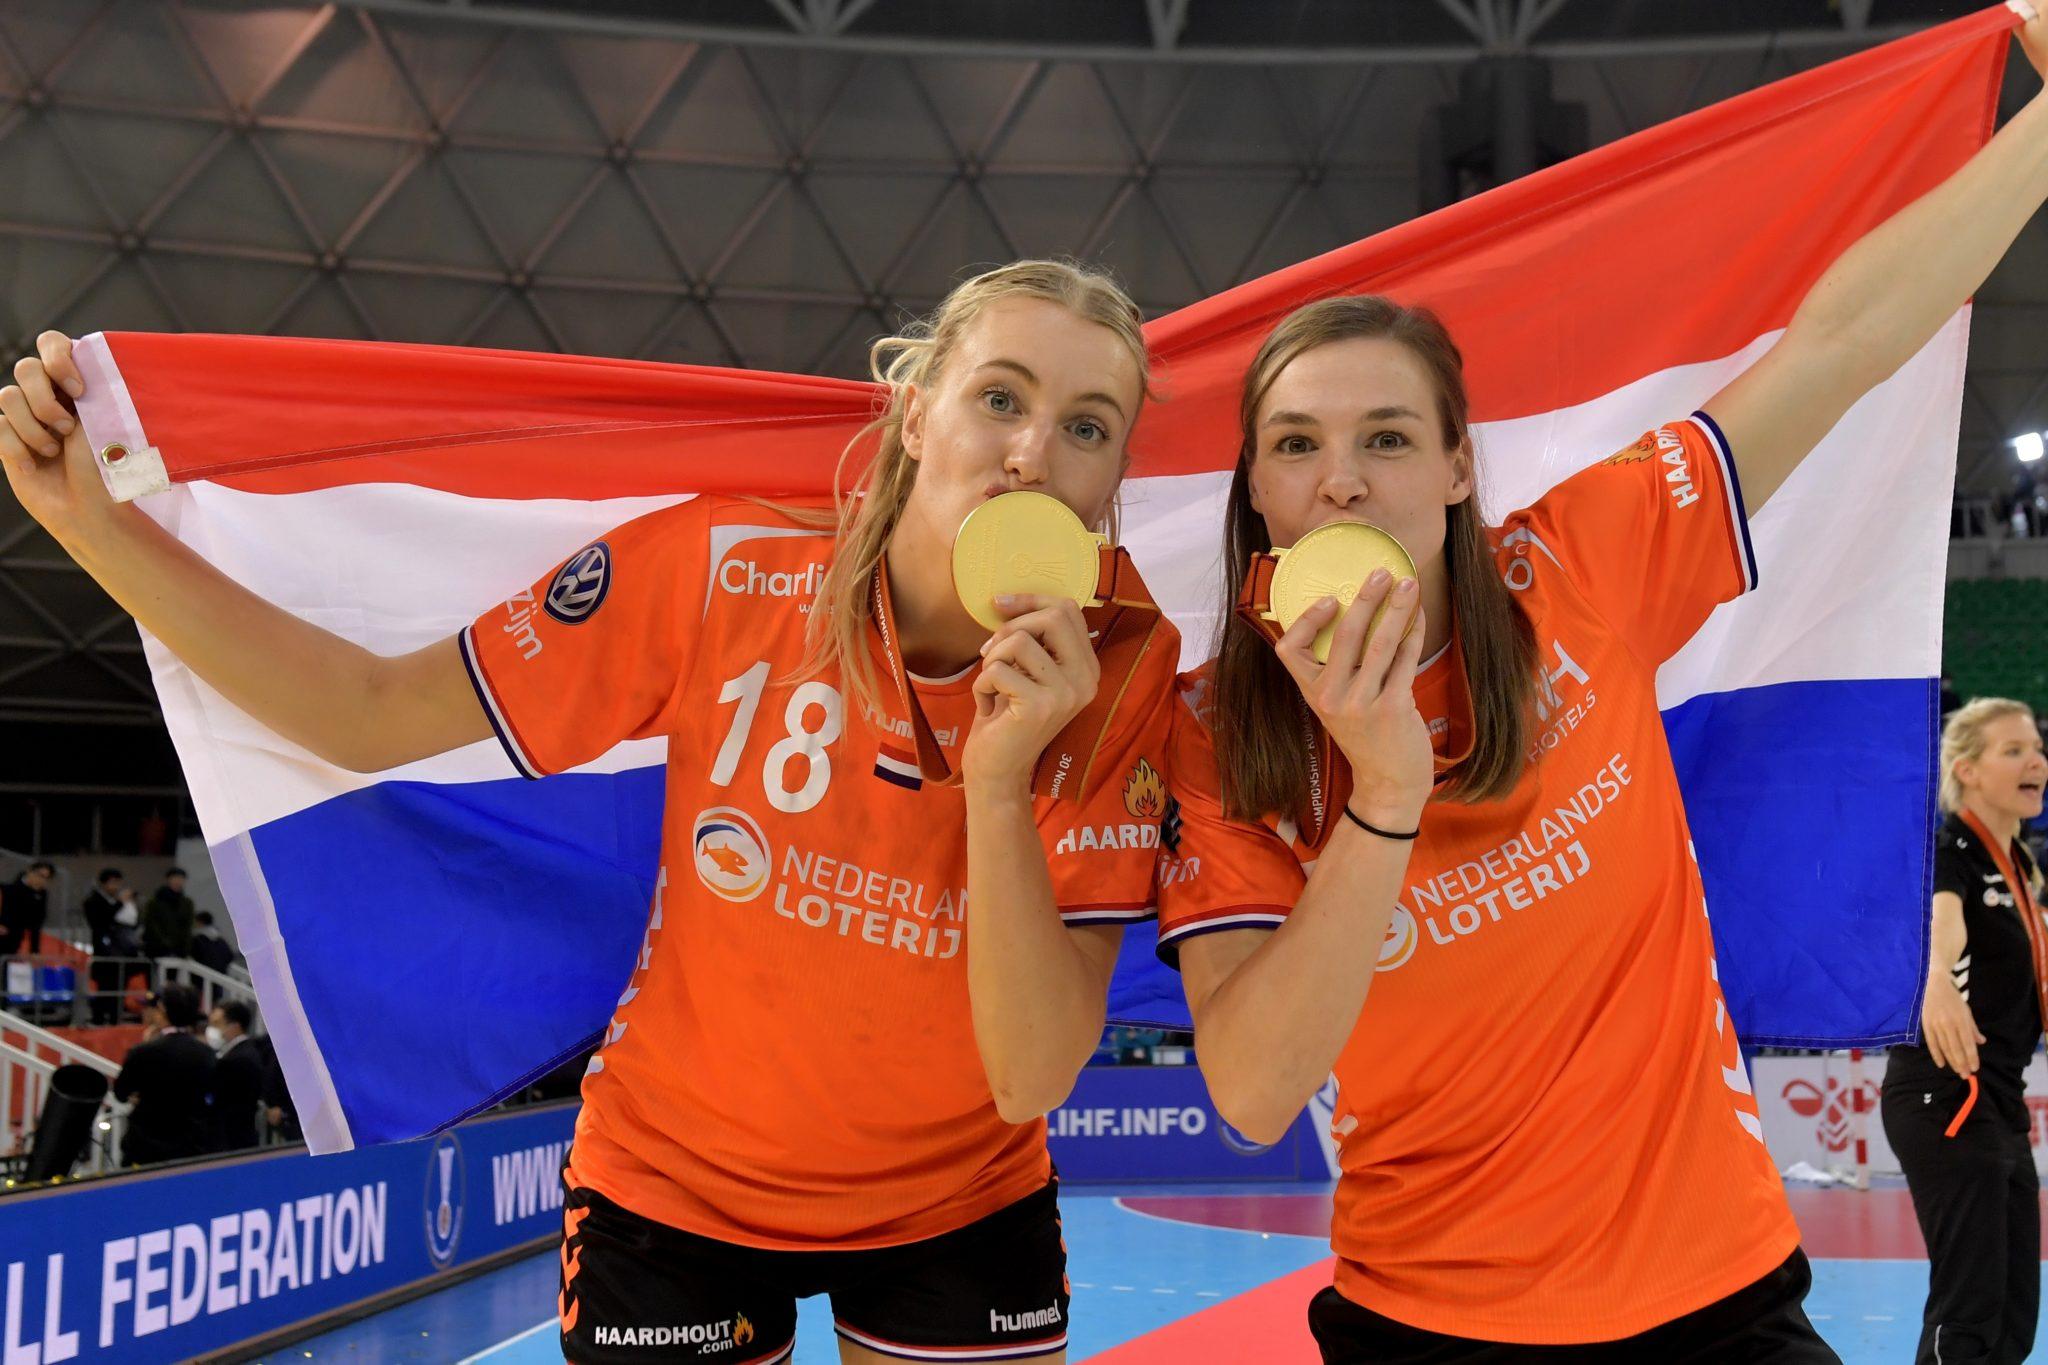 15-12-2019 HANDBAL:NEDERLAND-SPANJE:KUMAMOTO IHF Worldcup Japan, Finale Kelly Dulfer #18 NED En Inger Smits #20 NED